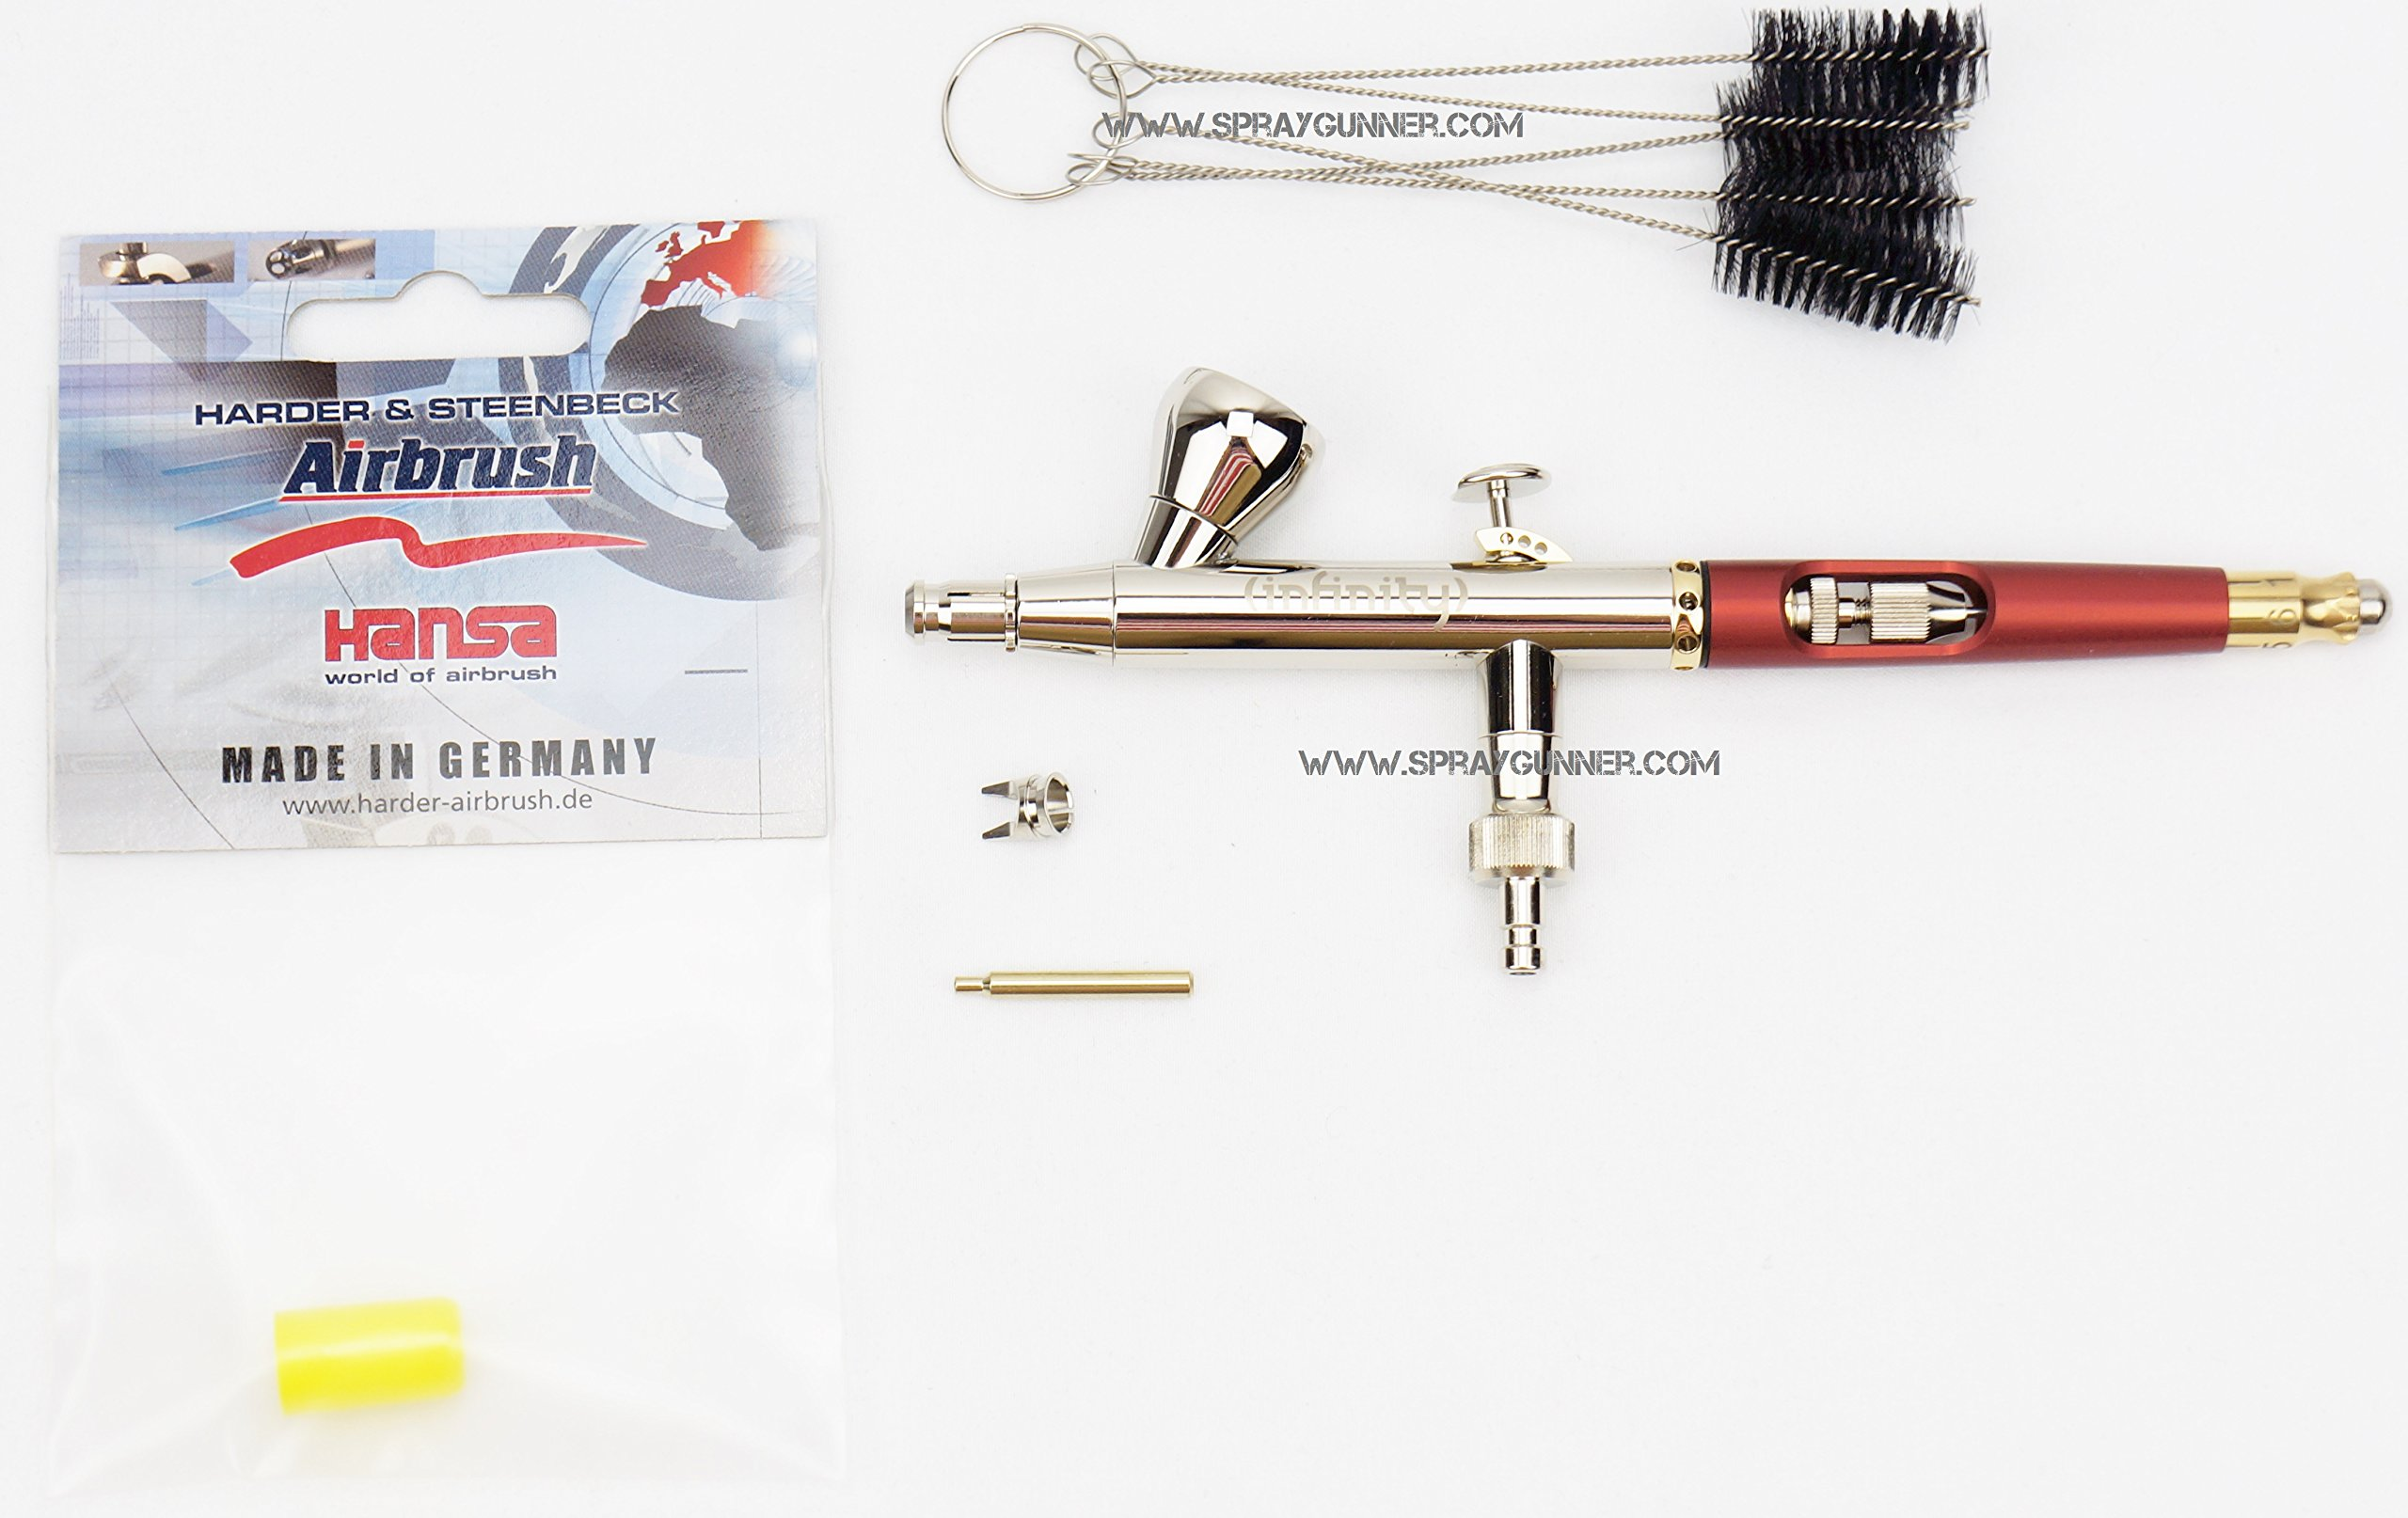 Harder and Steenbeck Infinity solo 0.15mm airbrush 126533 + BONUS by SprayGunner